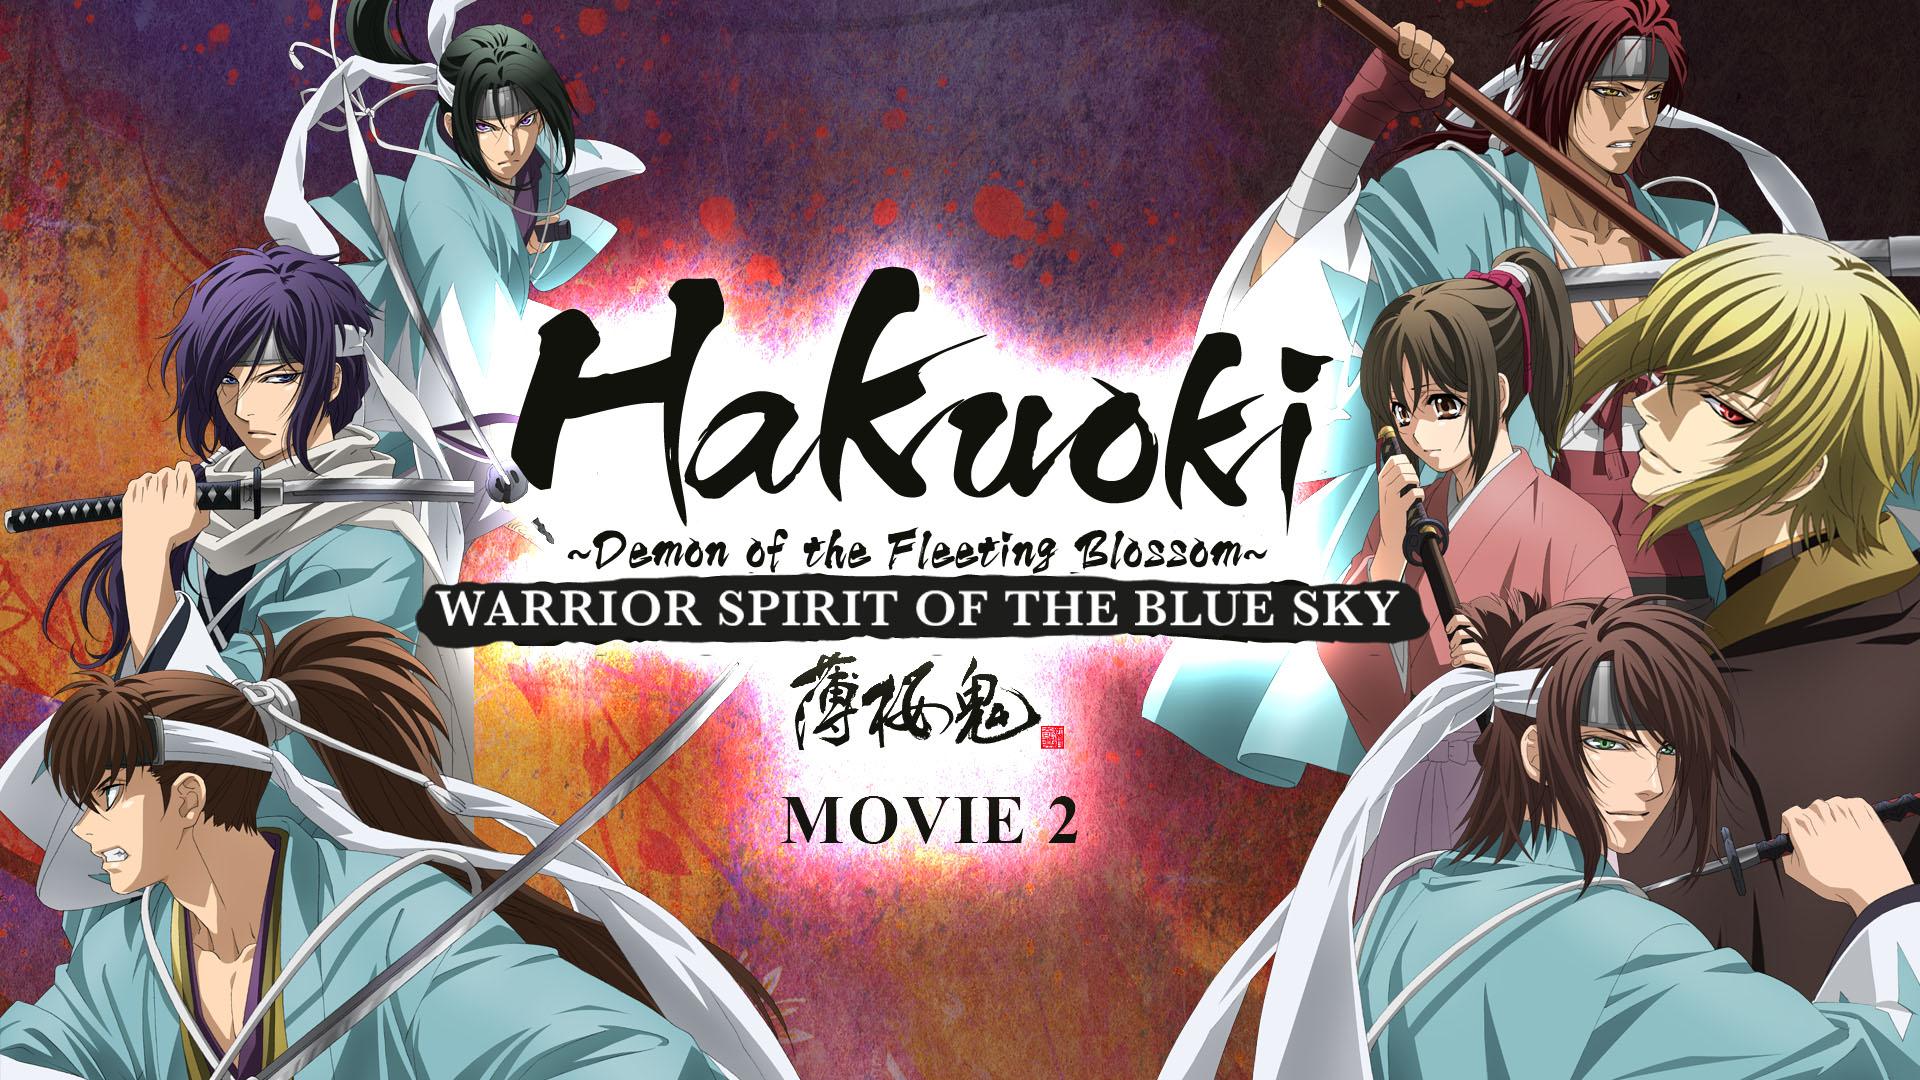 Hakuoki - The Movie 2 - Demon of the Fleeting Blossom - Warrior Spirit of the Blue Sky